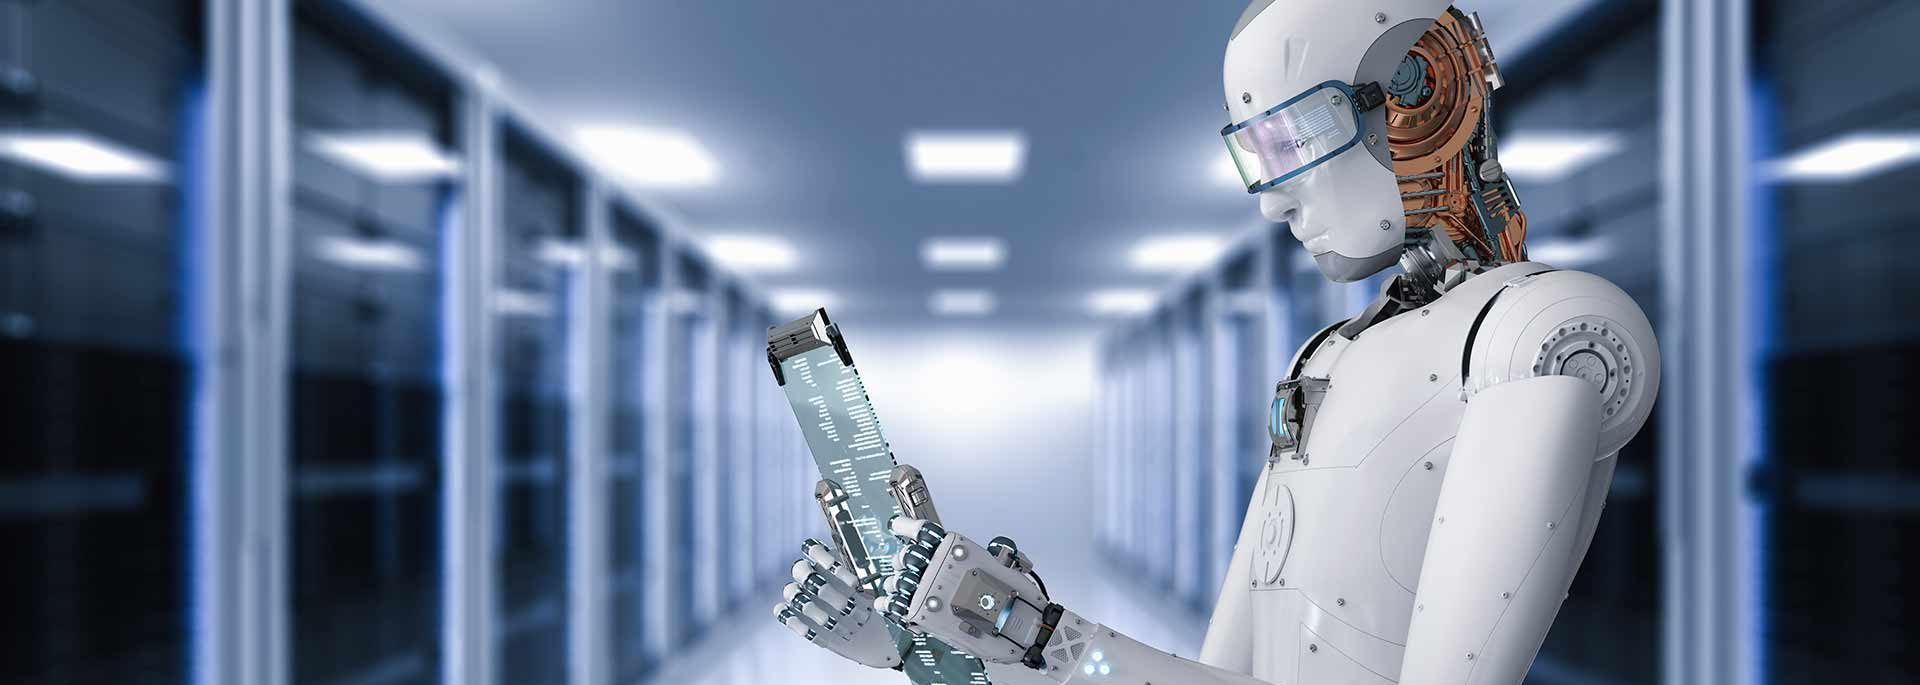 Roboter mit Tablet